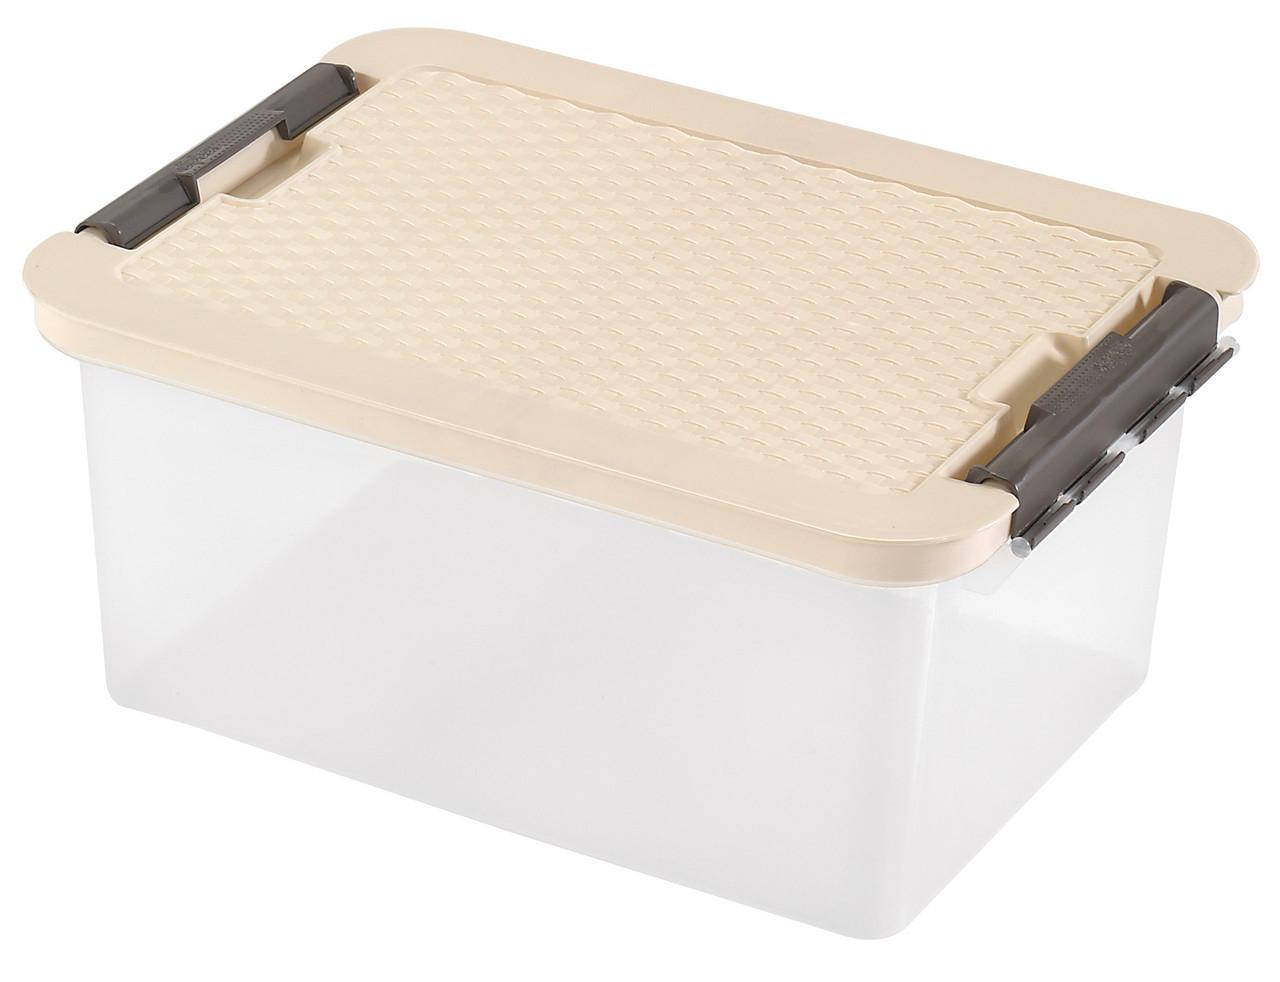 Ящик пластиковый для хранения Heidrun 14 л, 40х29х18 см (4604)